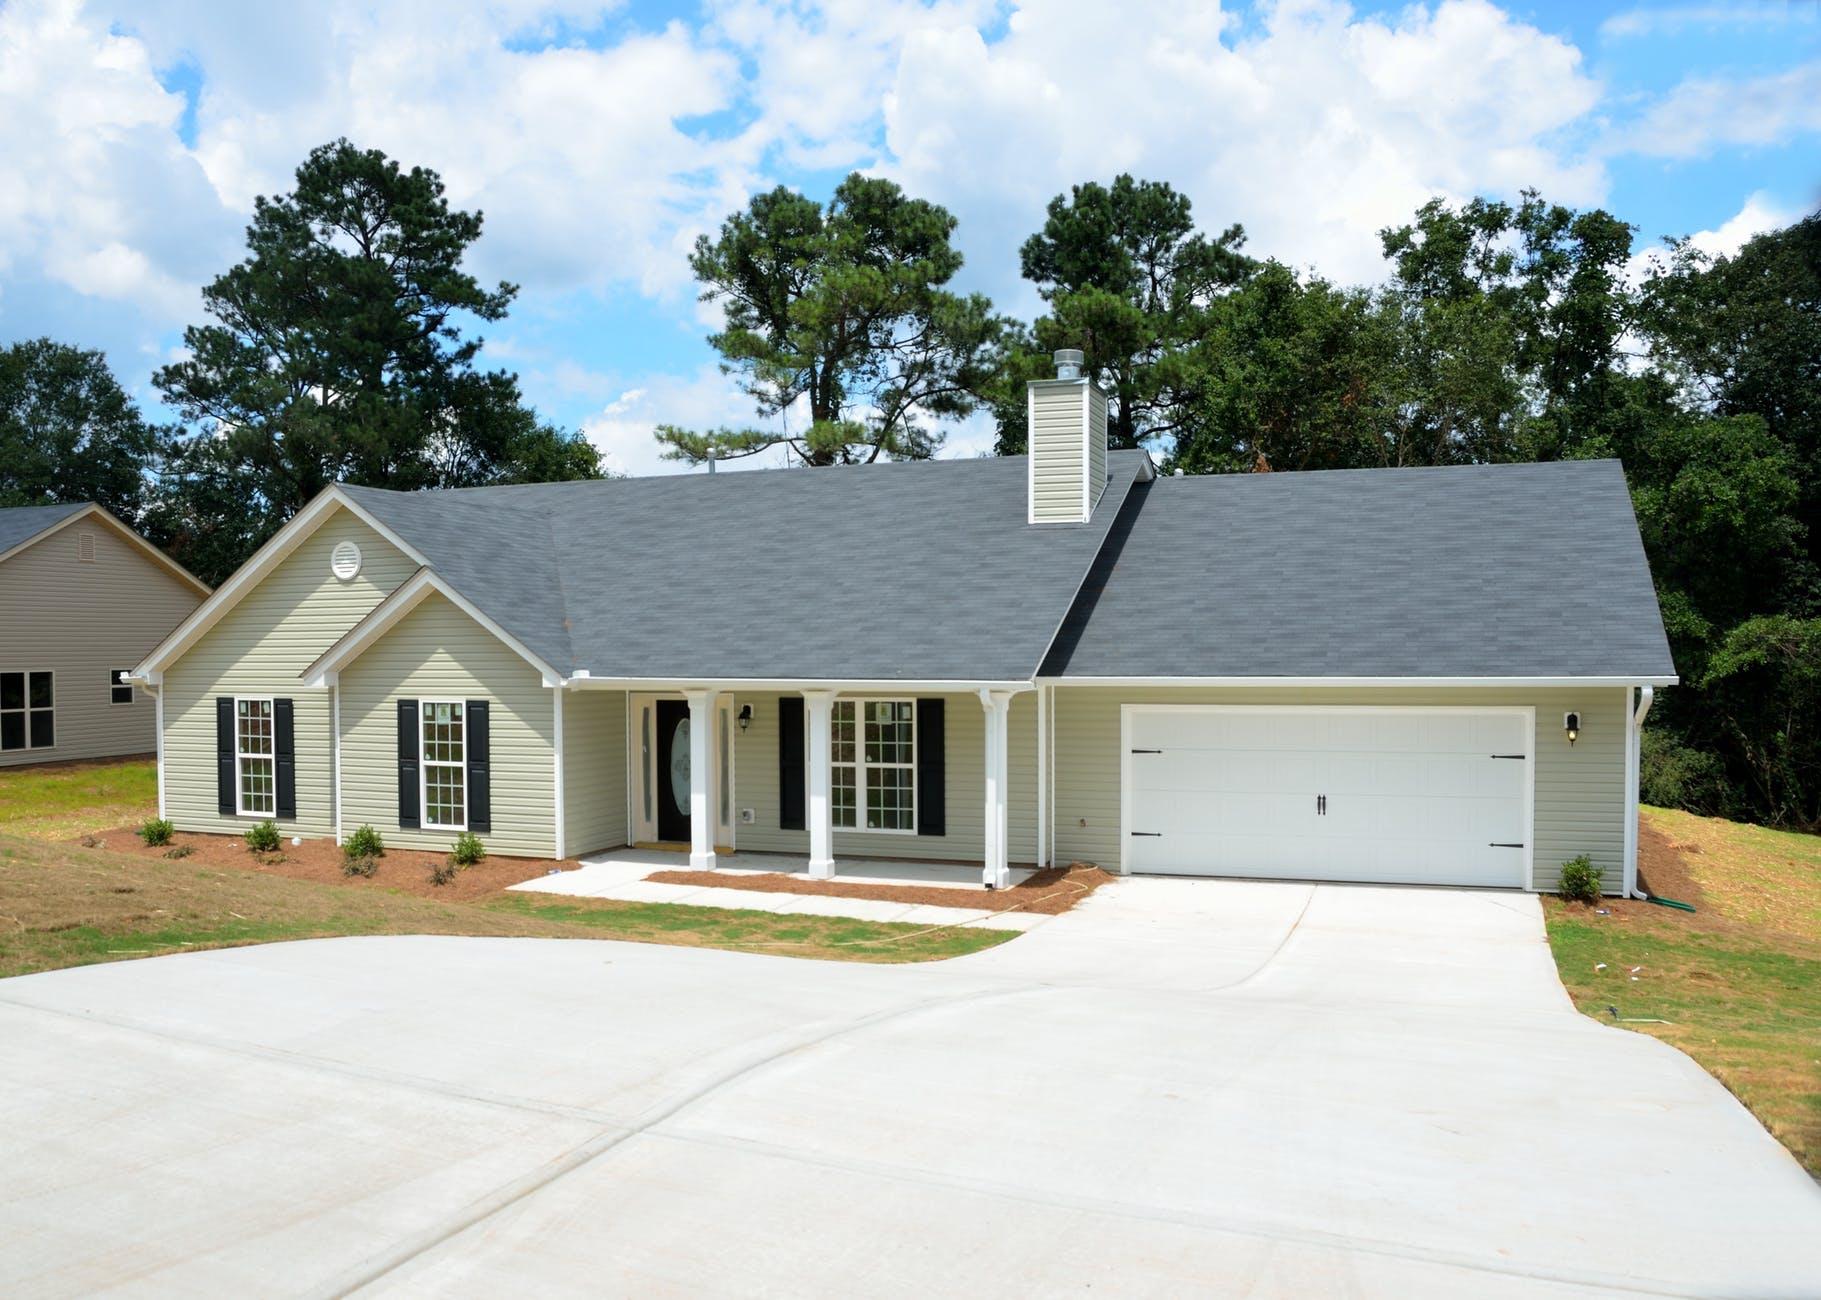 Expulsion locataire - Location immobilière